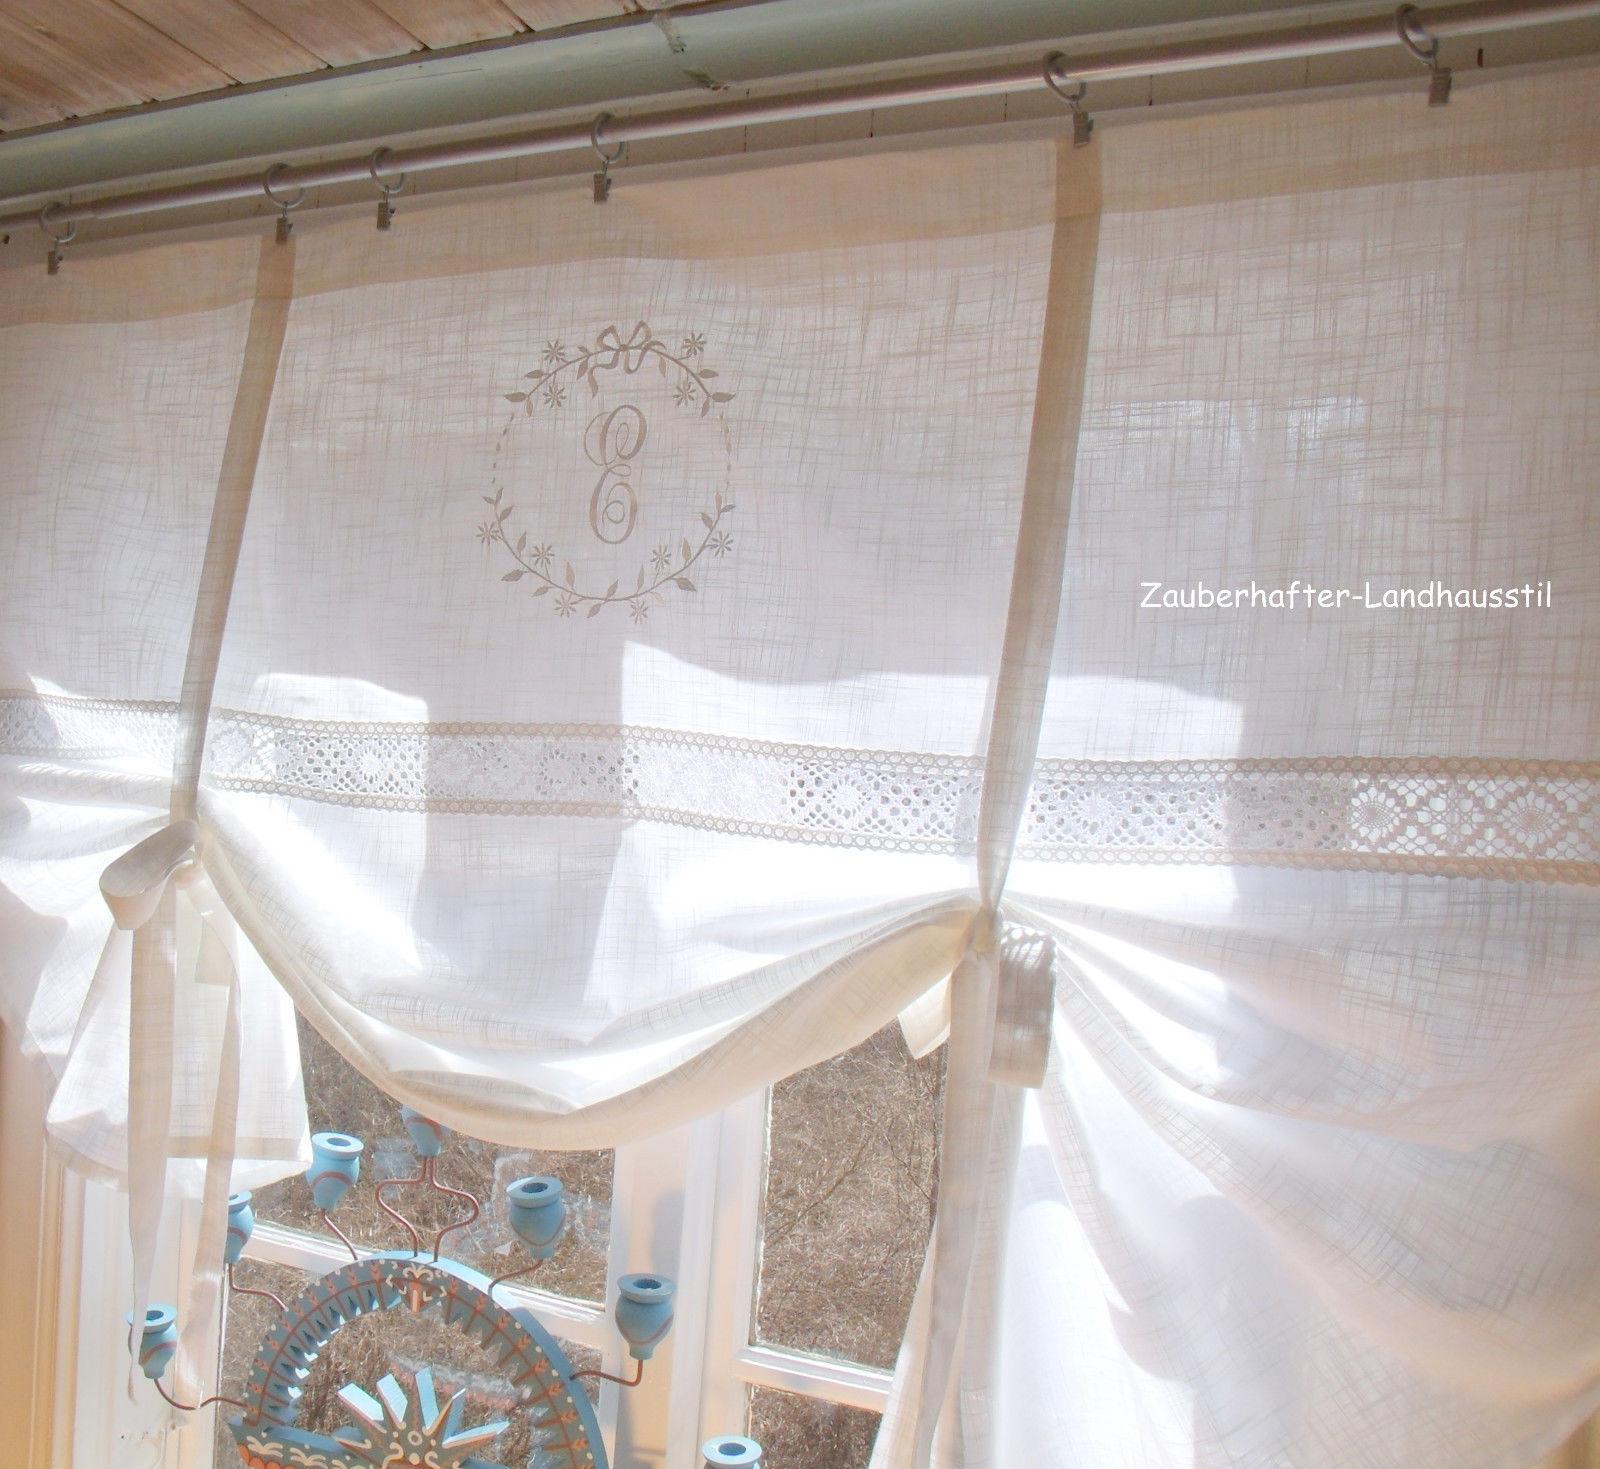 raff gardine crystal weiss 180x120 cm raffgardinen rollos gardinen zauberhafter landhausstil. Black Bedroom Furniture Sets. Home Design Ideas